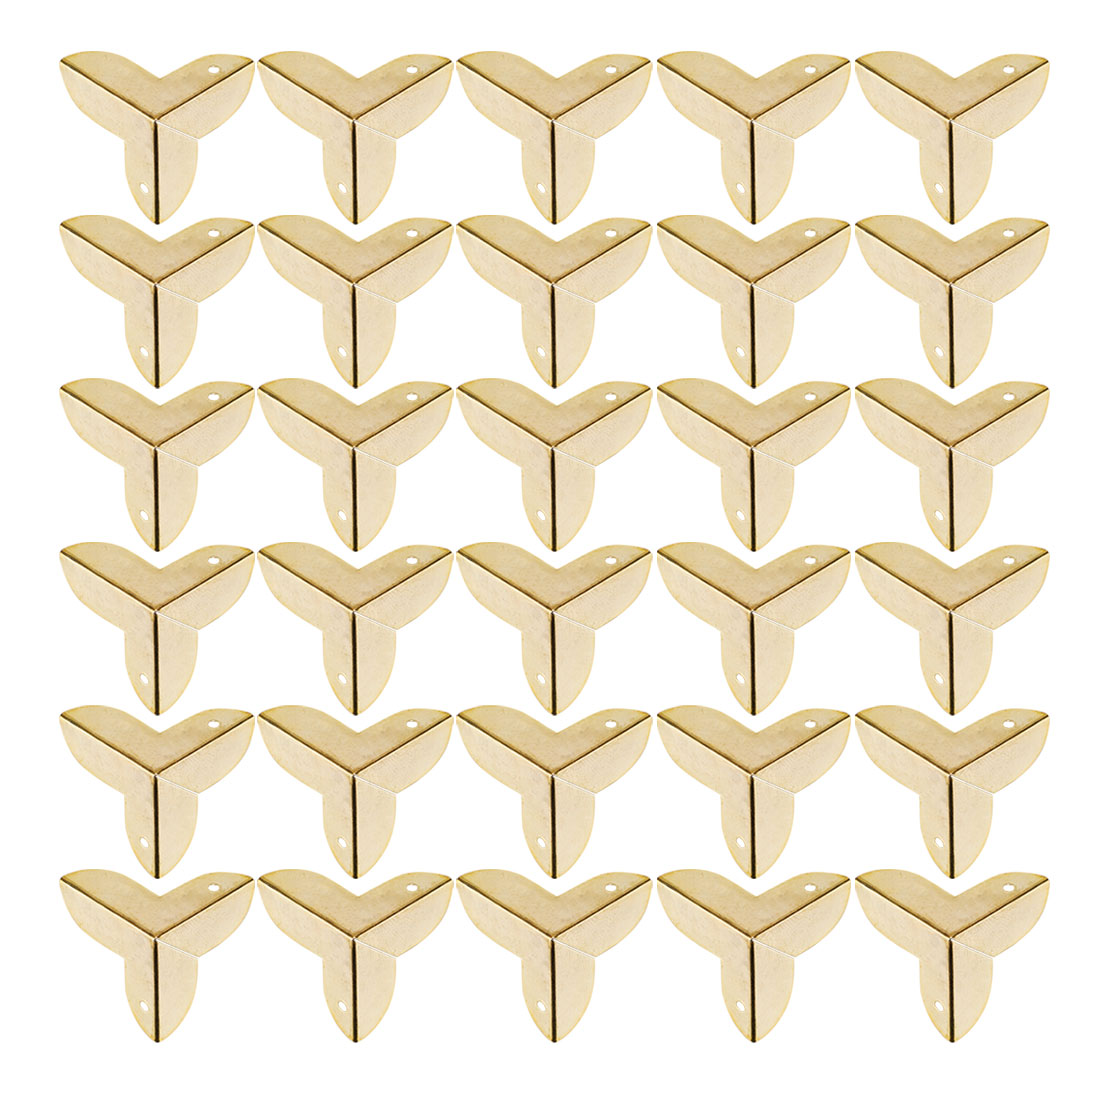 30pcs Box Corner Protector Gold Tone Triangle Frame Desk Box Furniture Protector